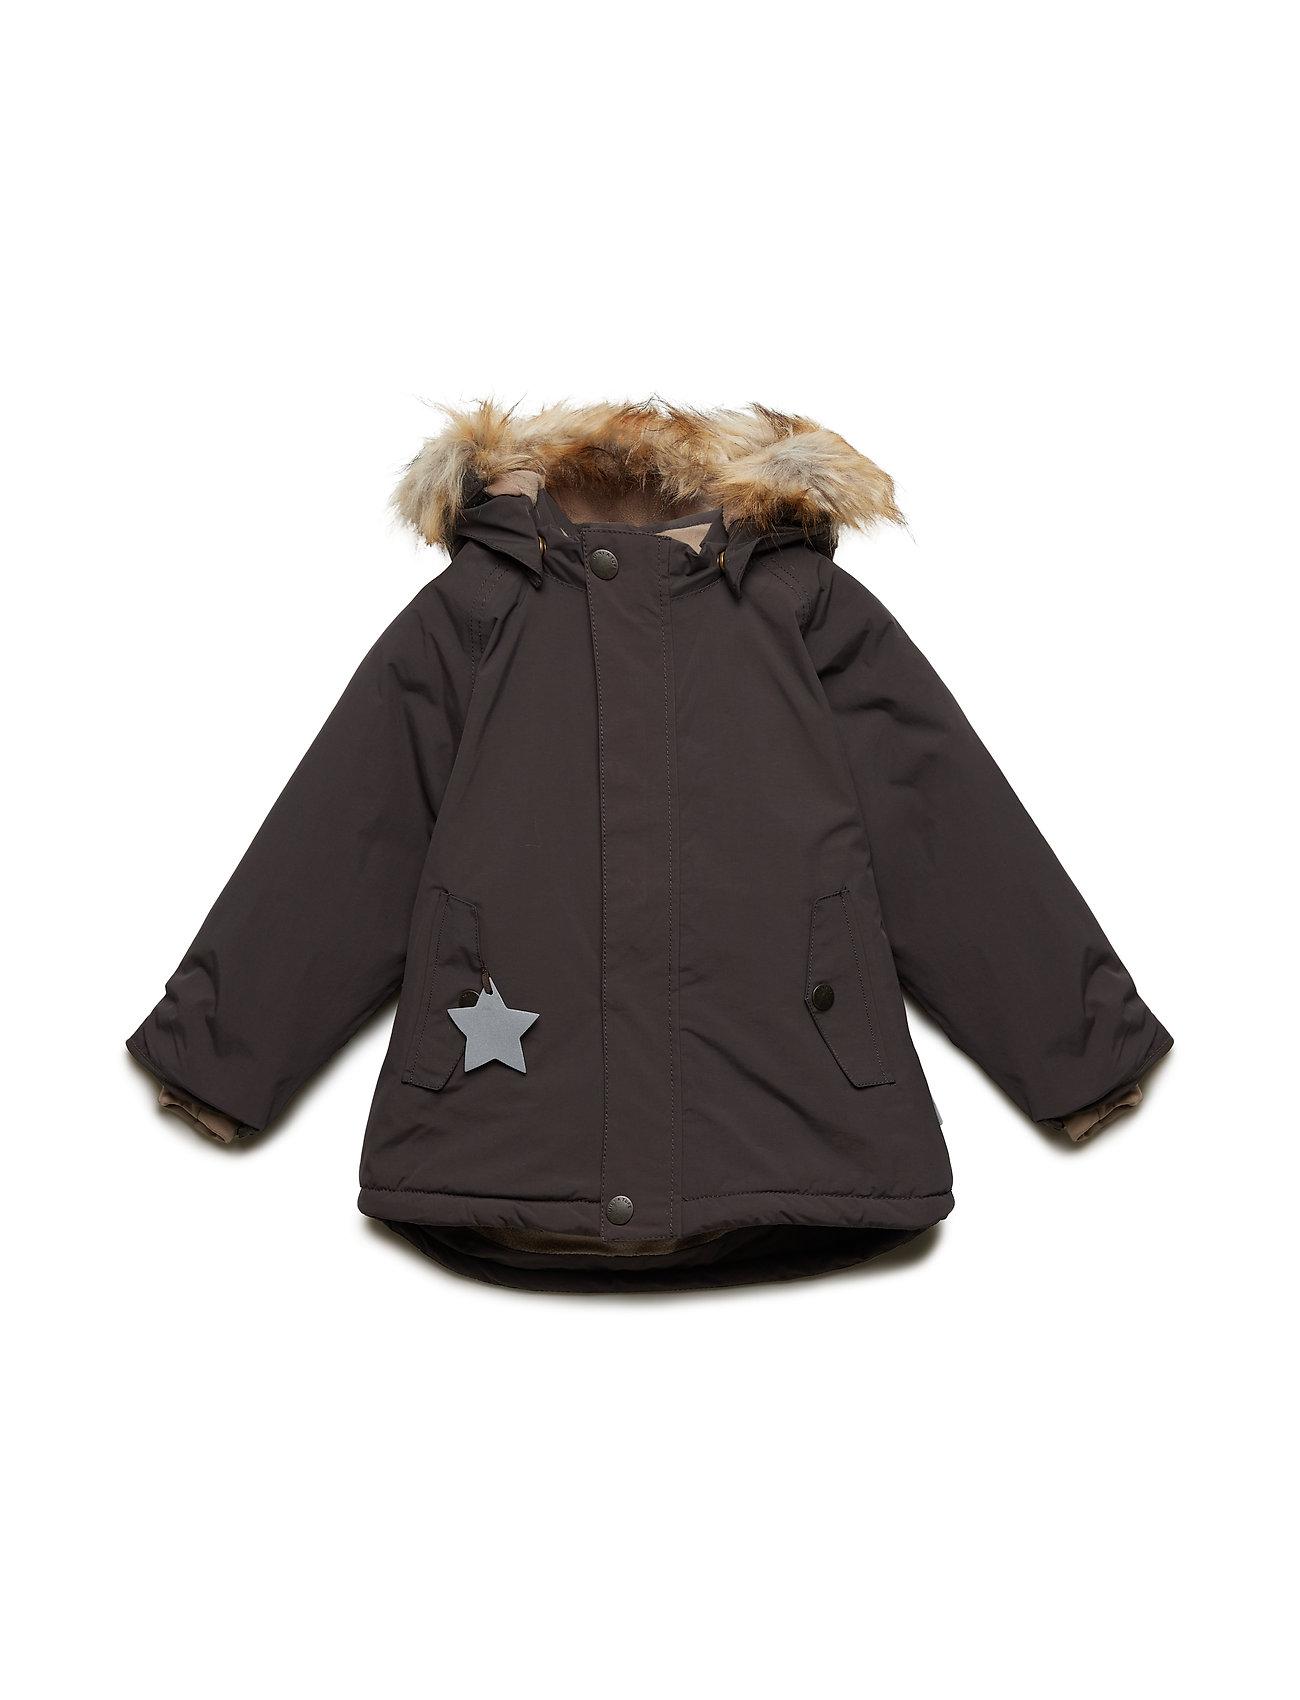 Mini A Ture Wally Jacket 4y